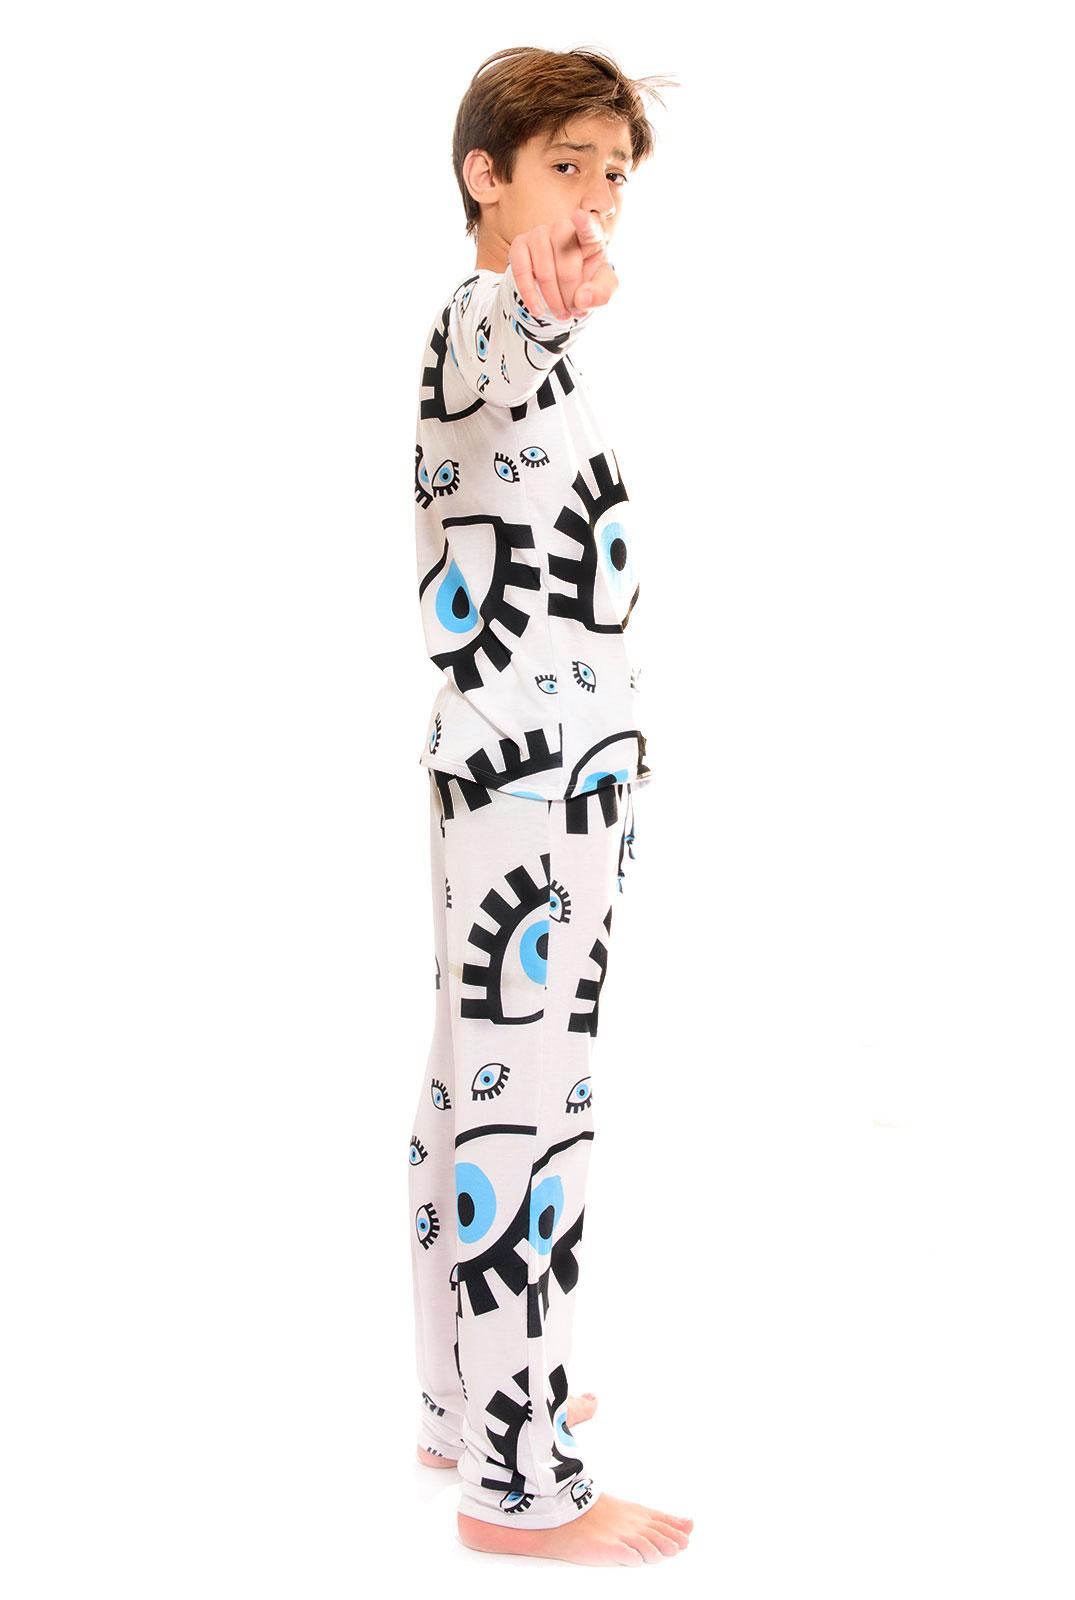 Pijama Longo Thais Gusmão Infanto Juvenil UNISEX Olho Grego Branco